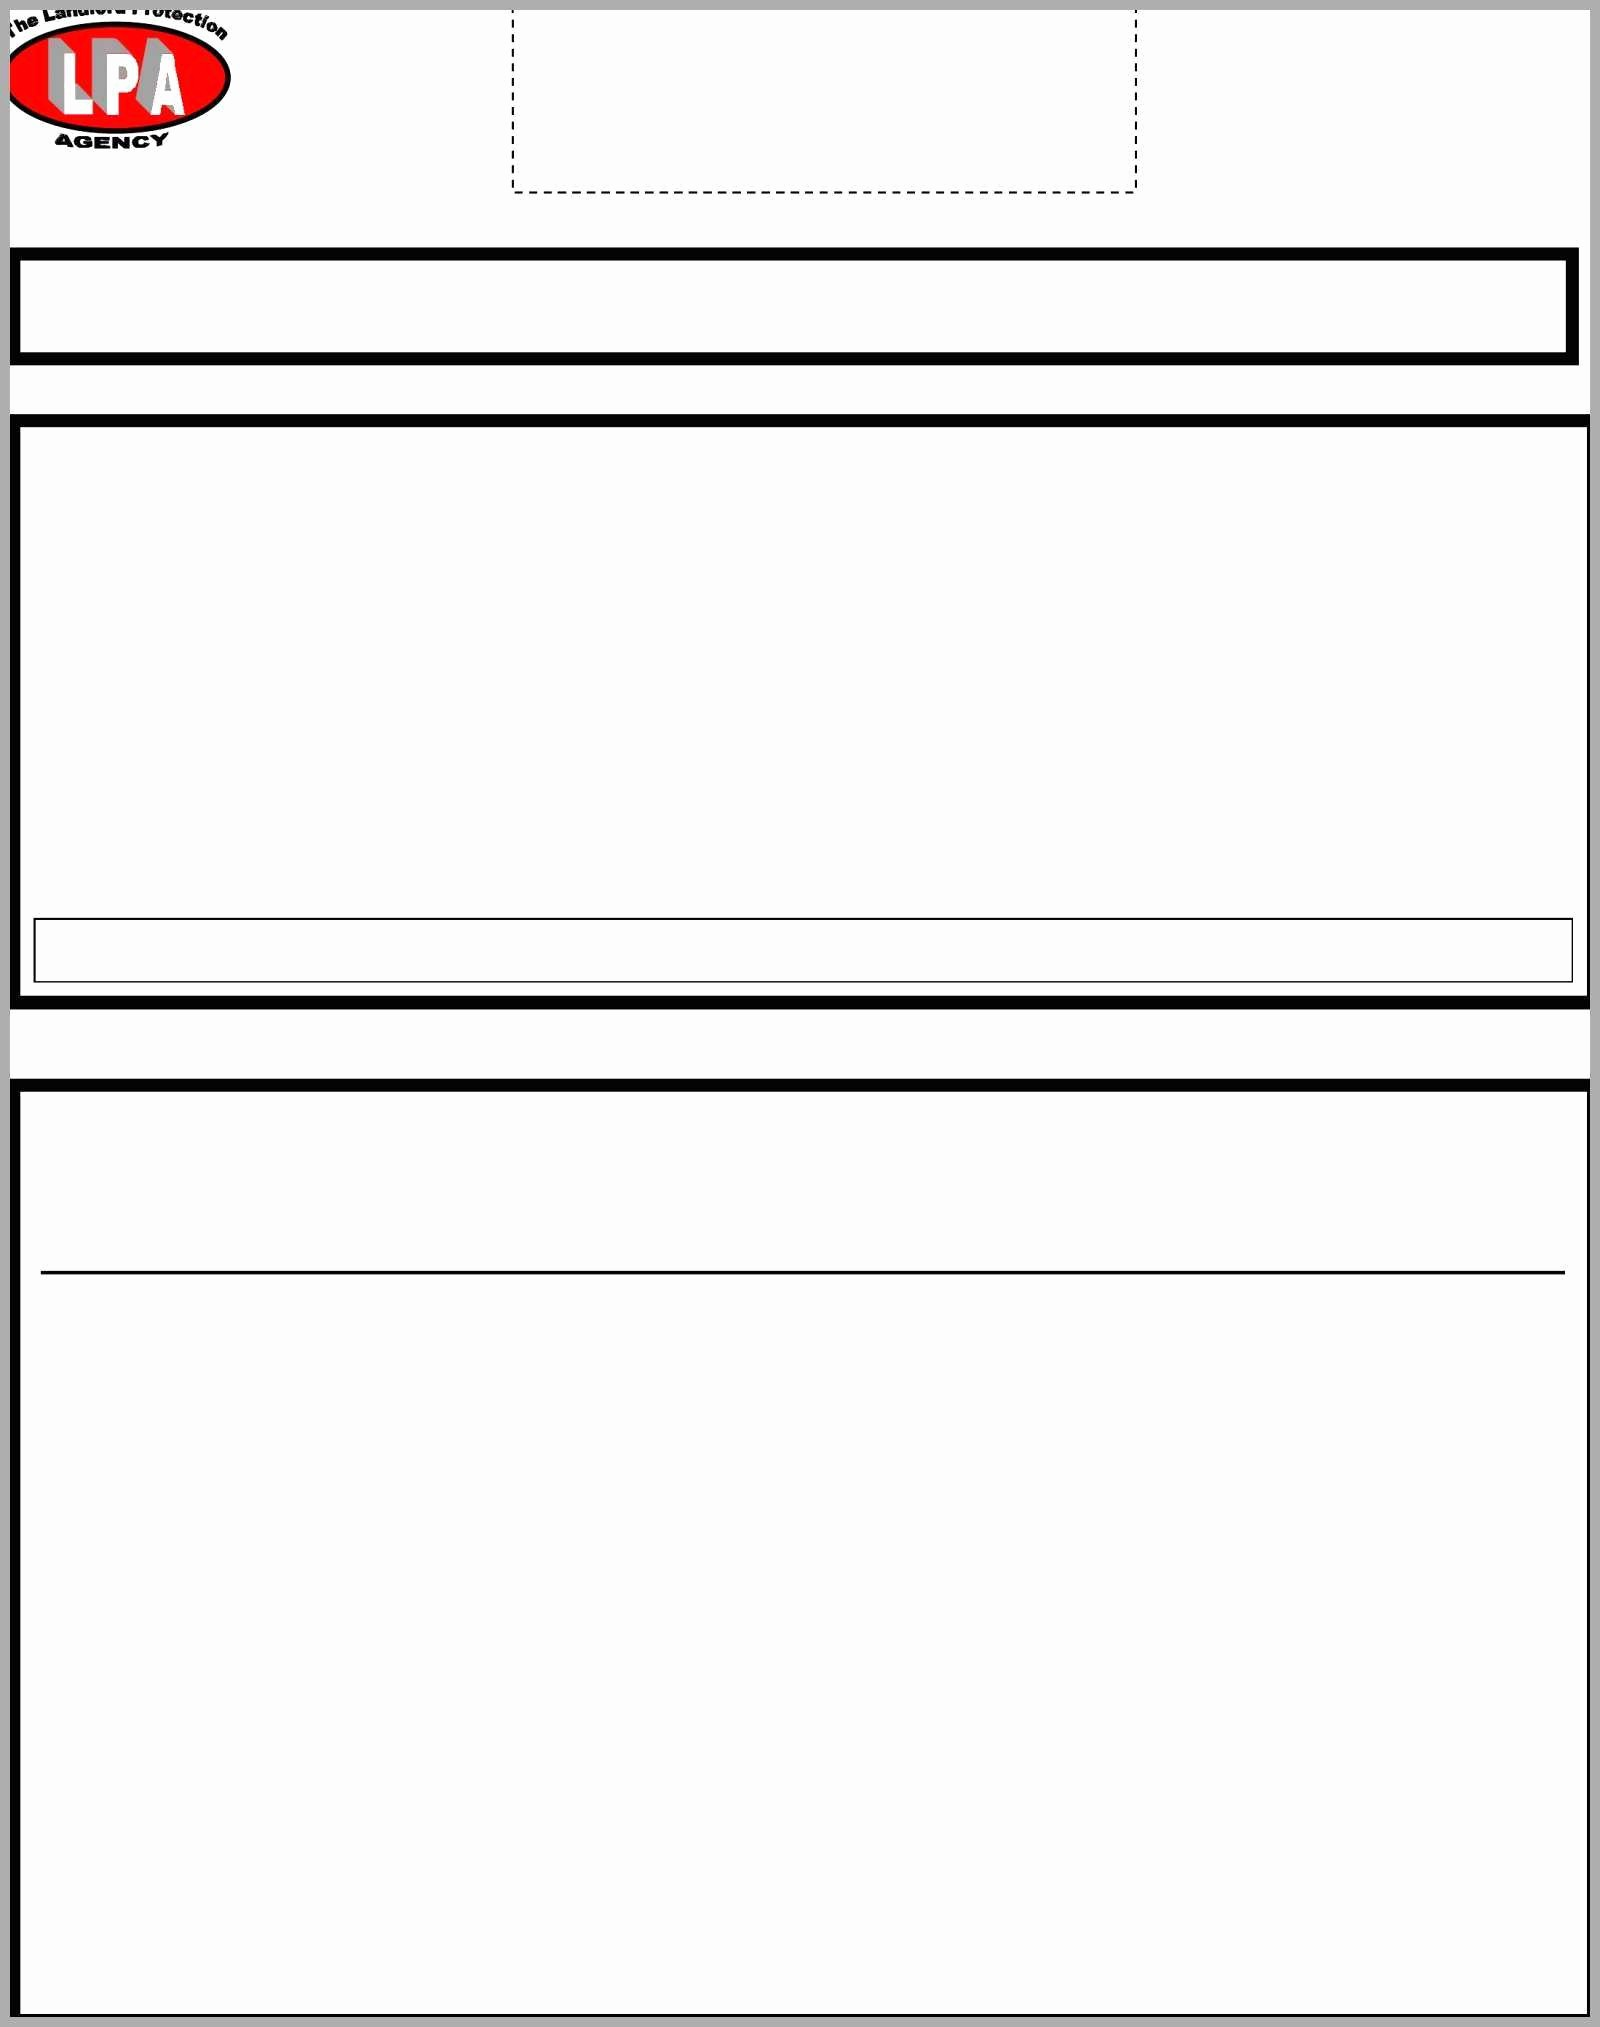 Maintenance Work order Template Excel Beautiful 98 Work order Request form Template Work order Request